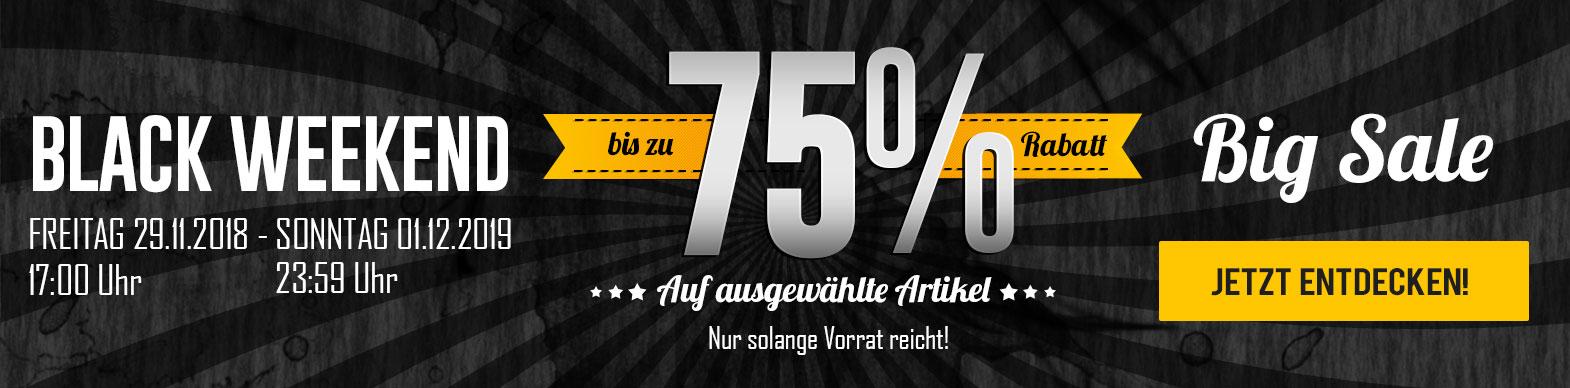 BLACK WEEKEND bei EXVAPE zb. eXpromizer V3 Fire 2 ml Black-Gunmetal, alle Farben verfügbar